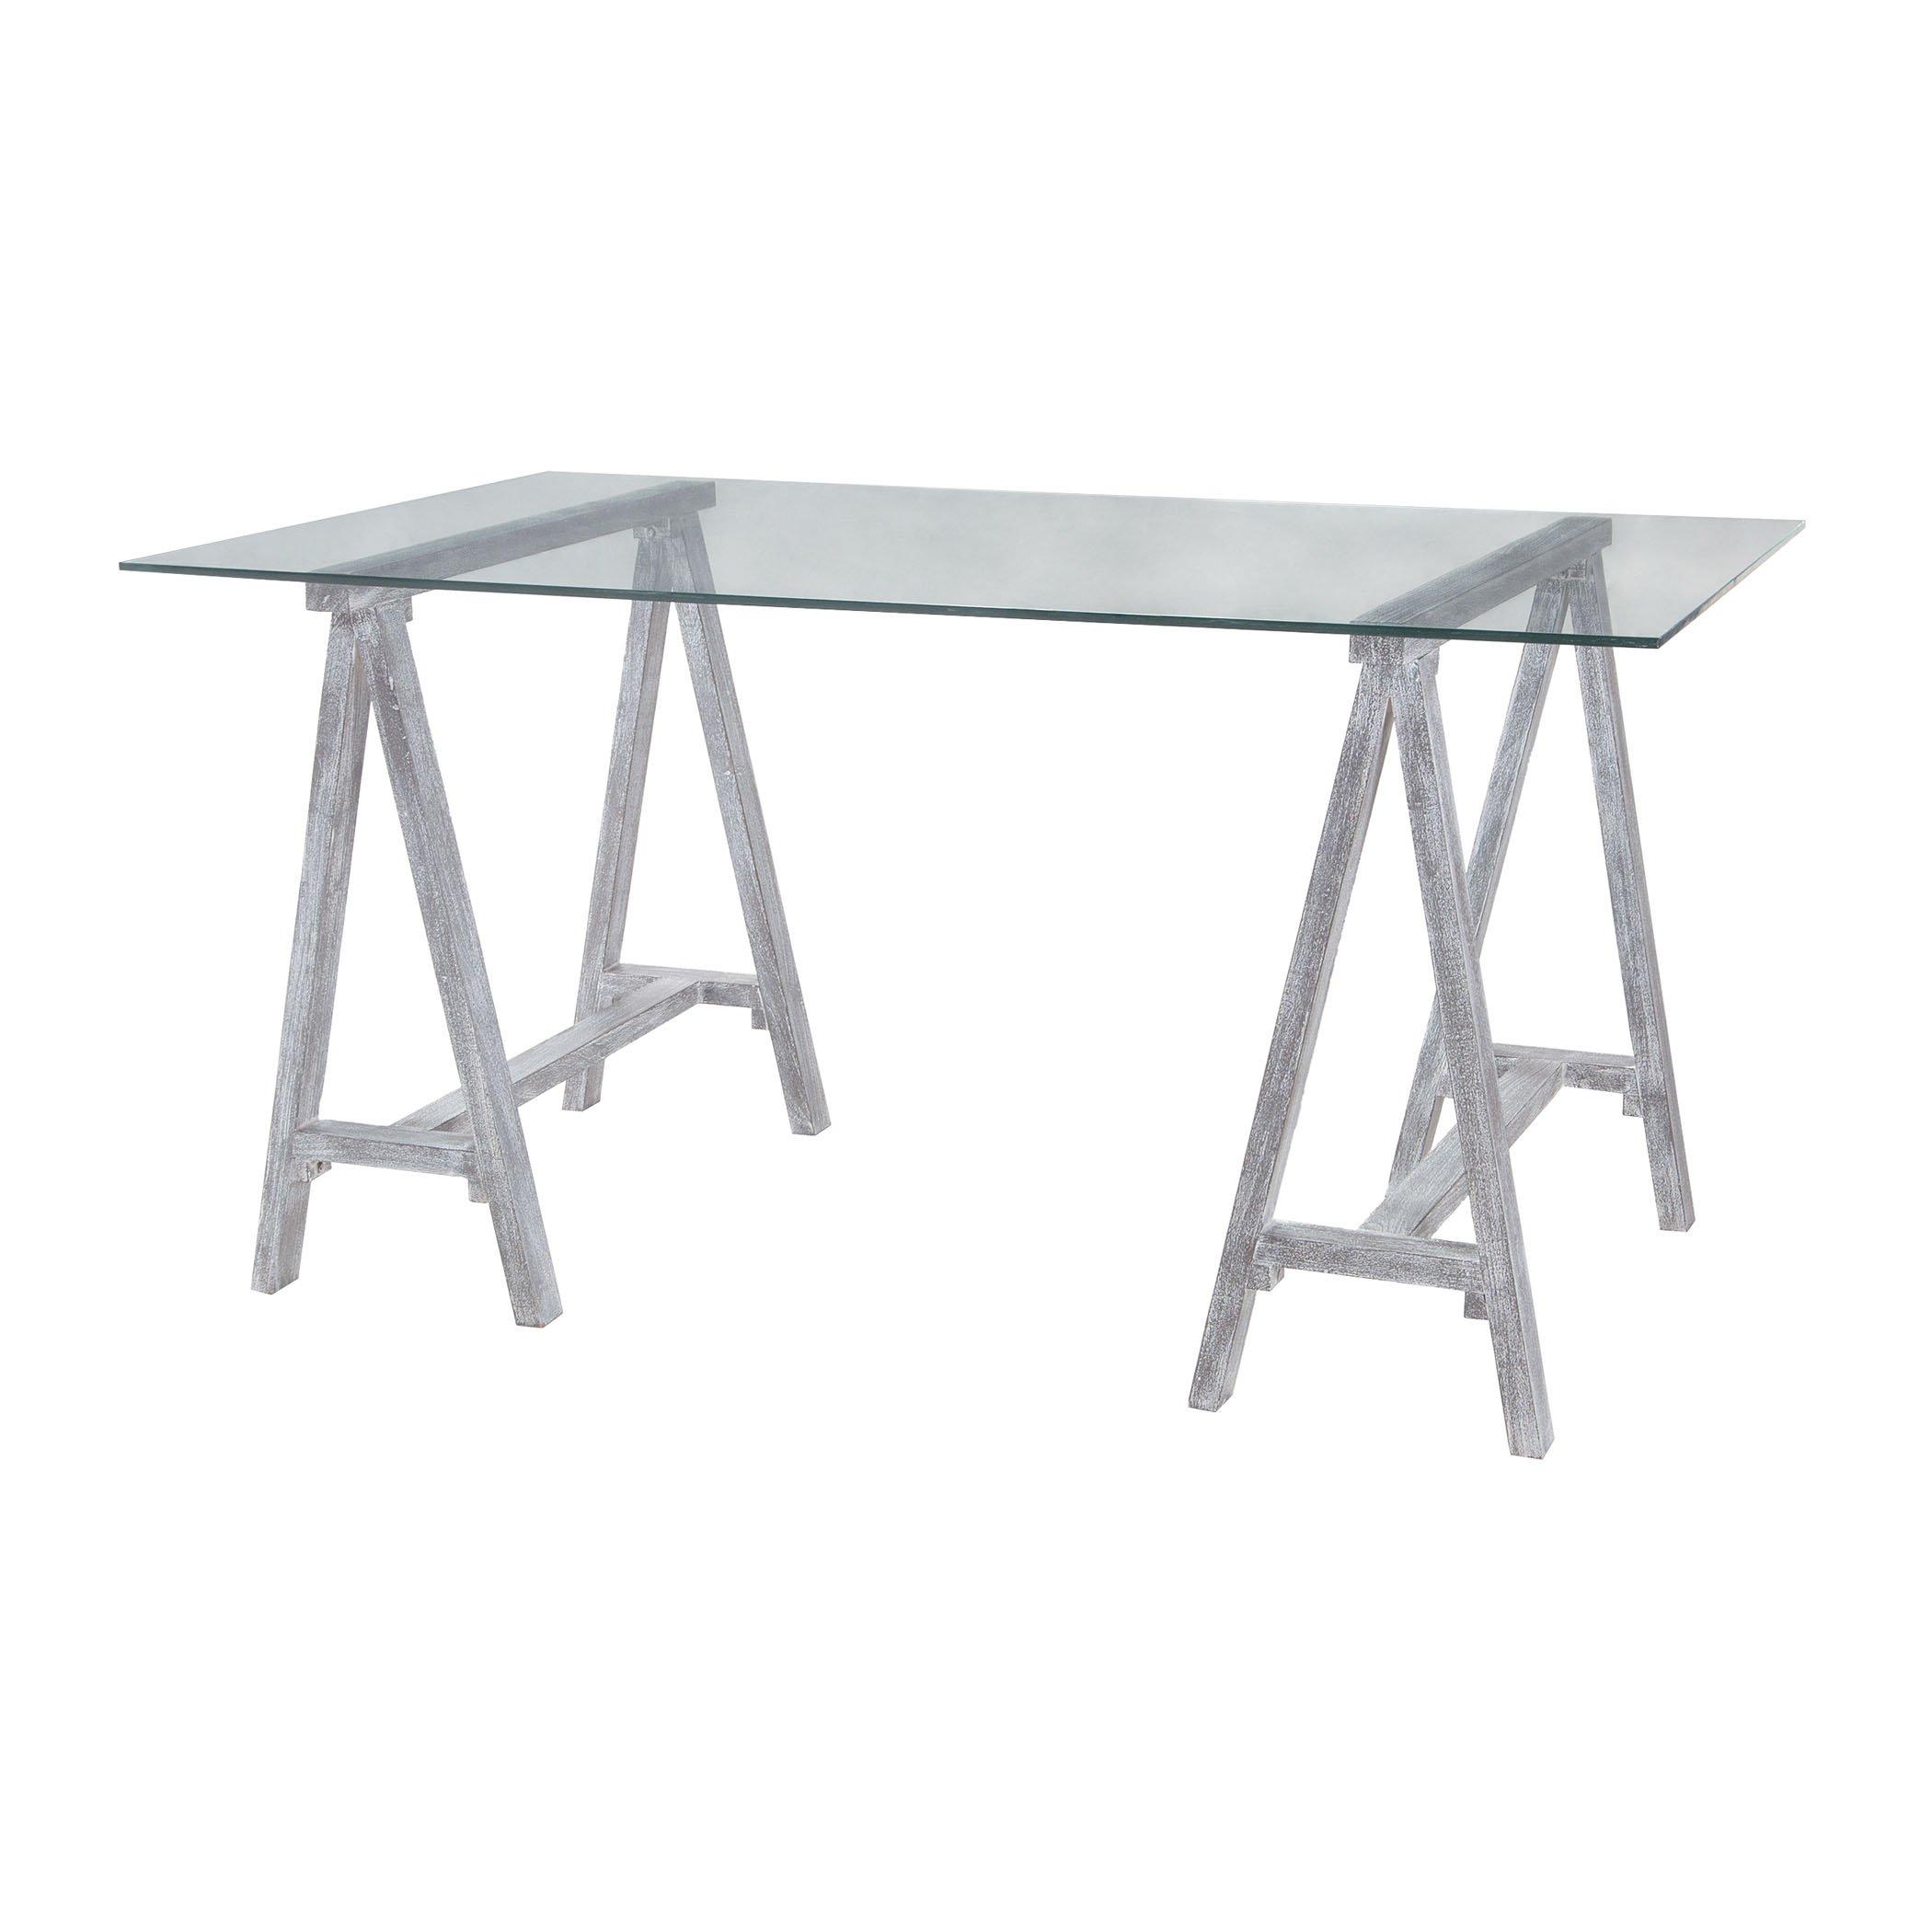 Dimond Home 7011-011 Coastal Cool Architects Table, 60'' x 36'' x 31''